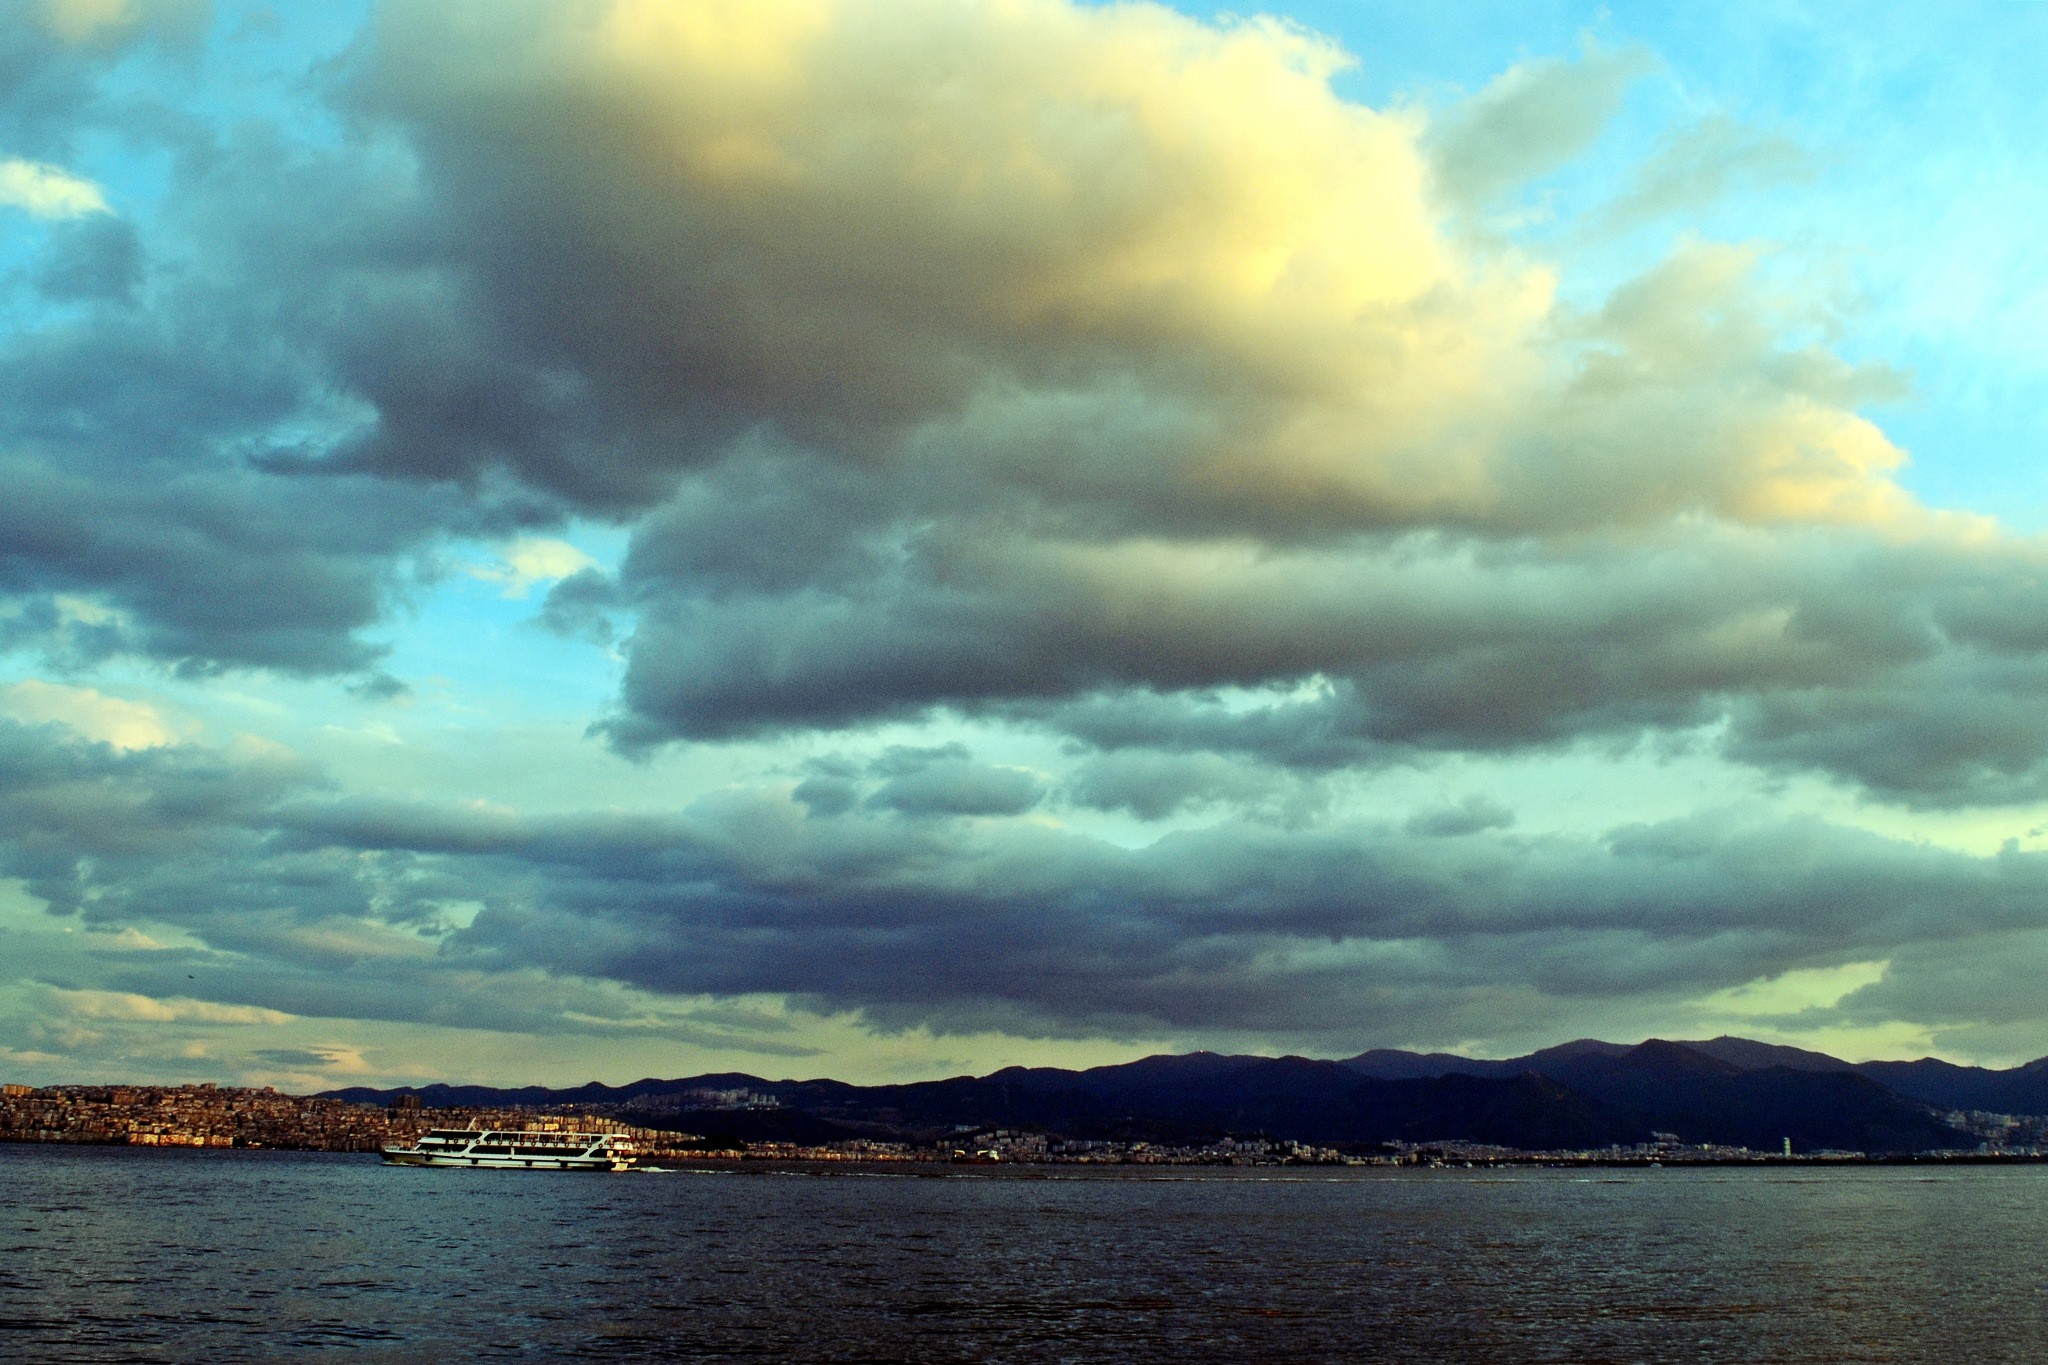 My city after rain. by özlem sülo